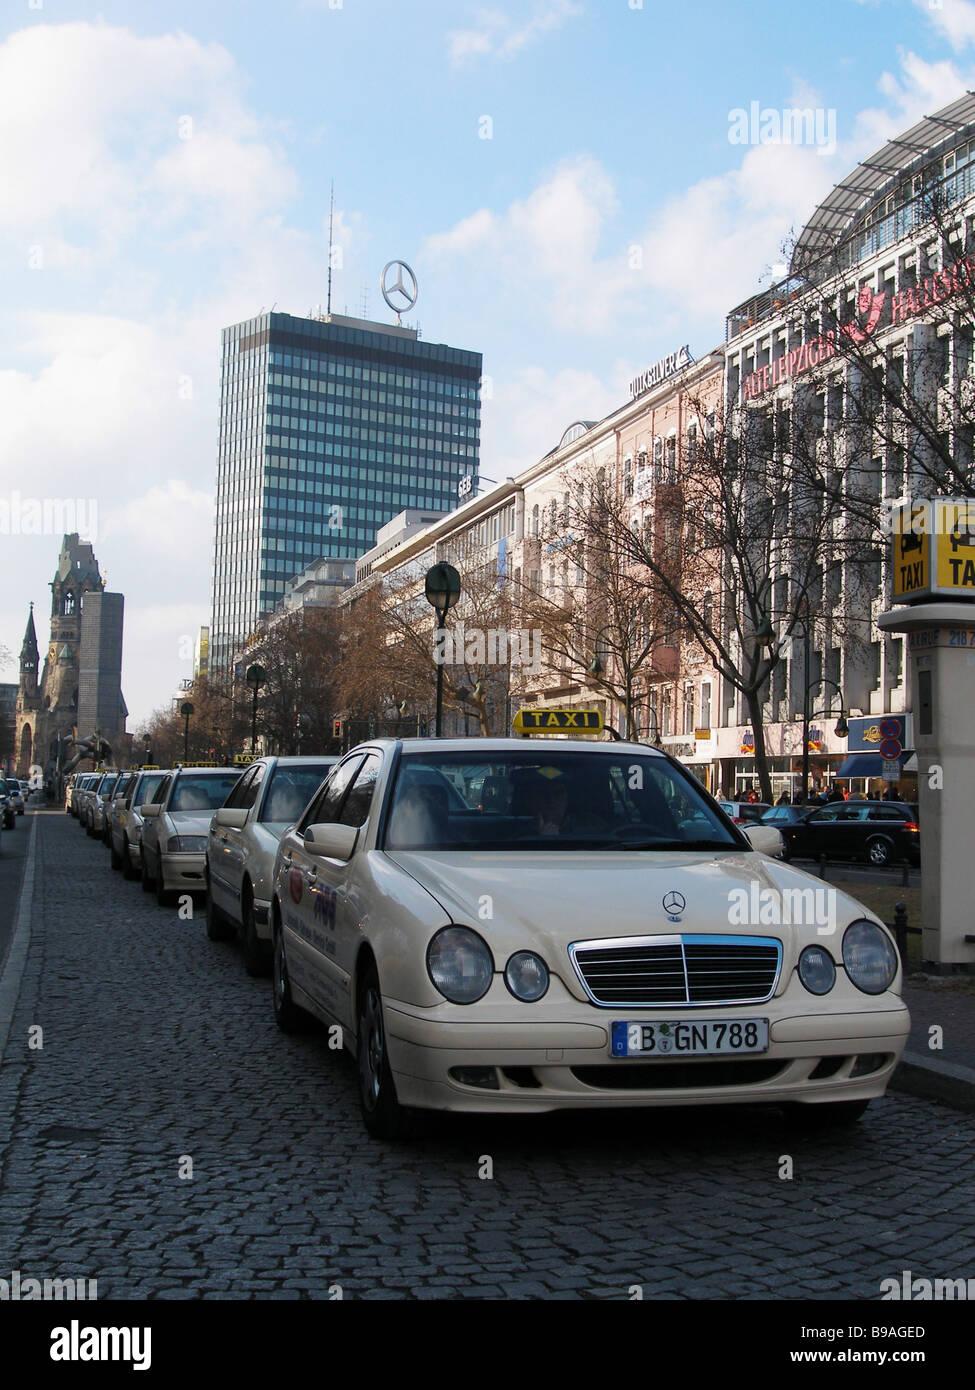 Mercedes cars symbolize German quality goods - Stock Image